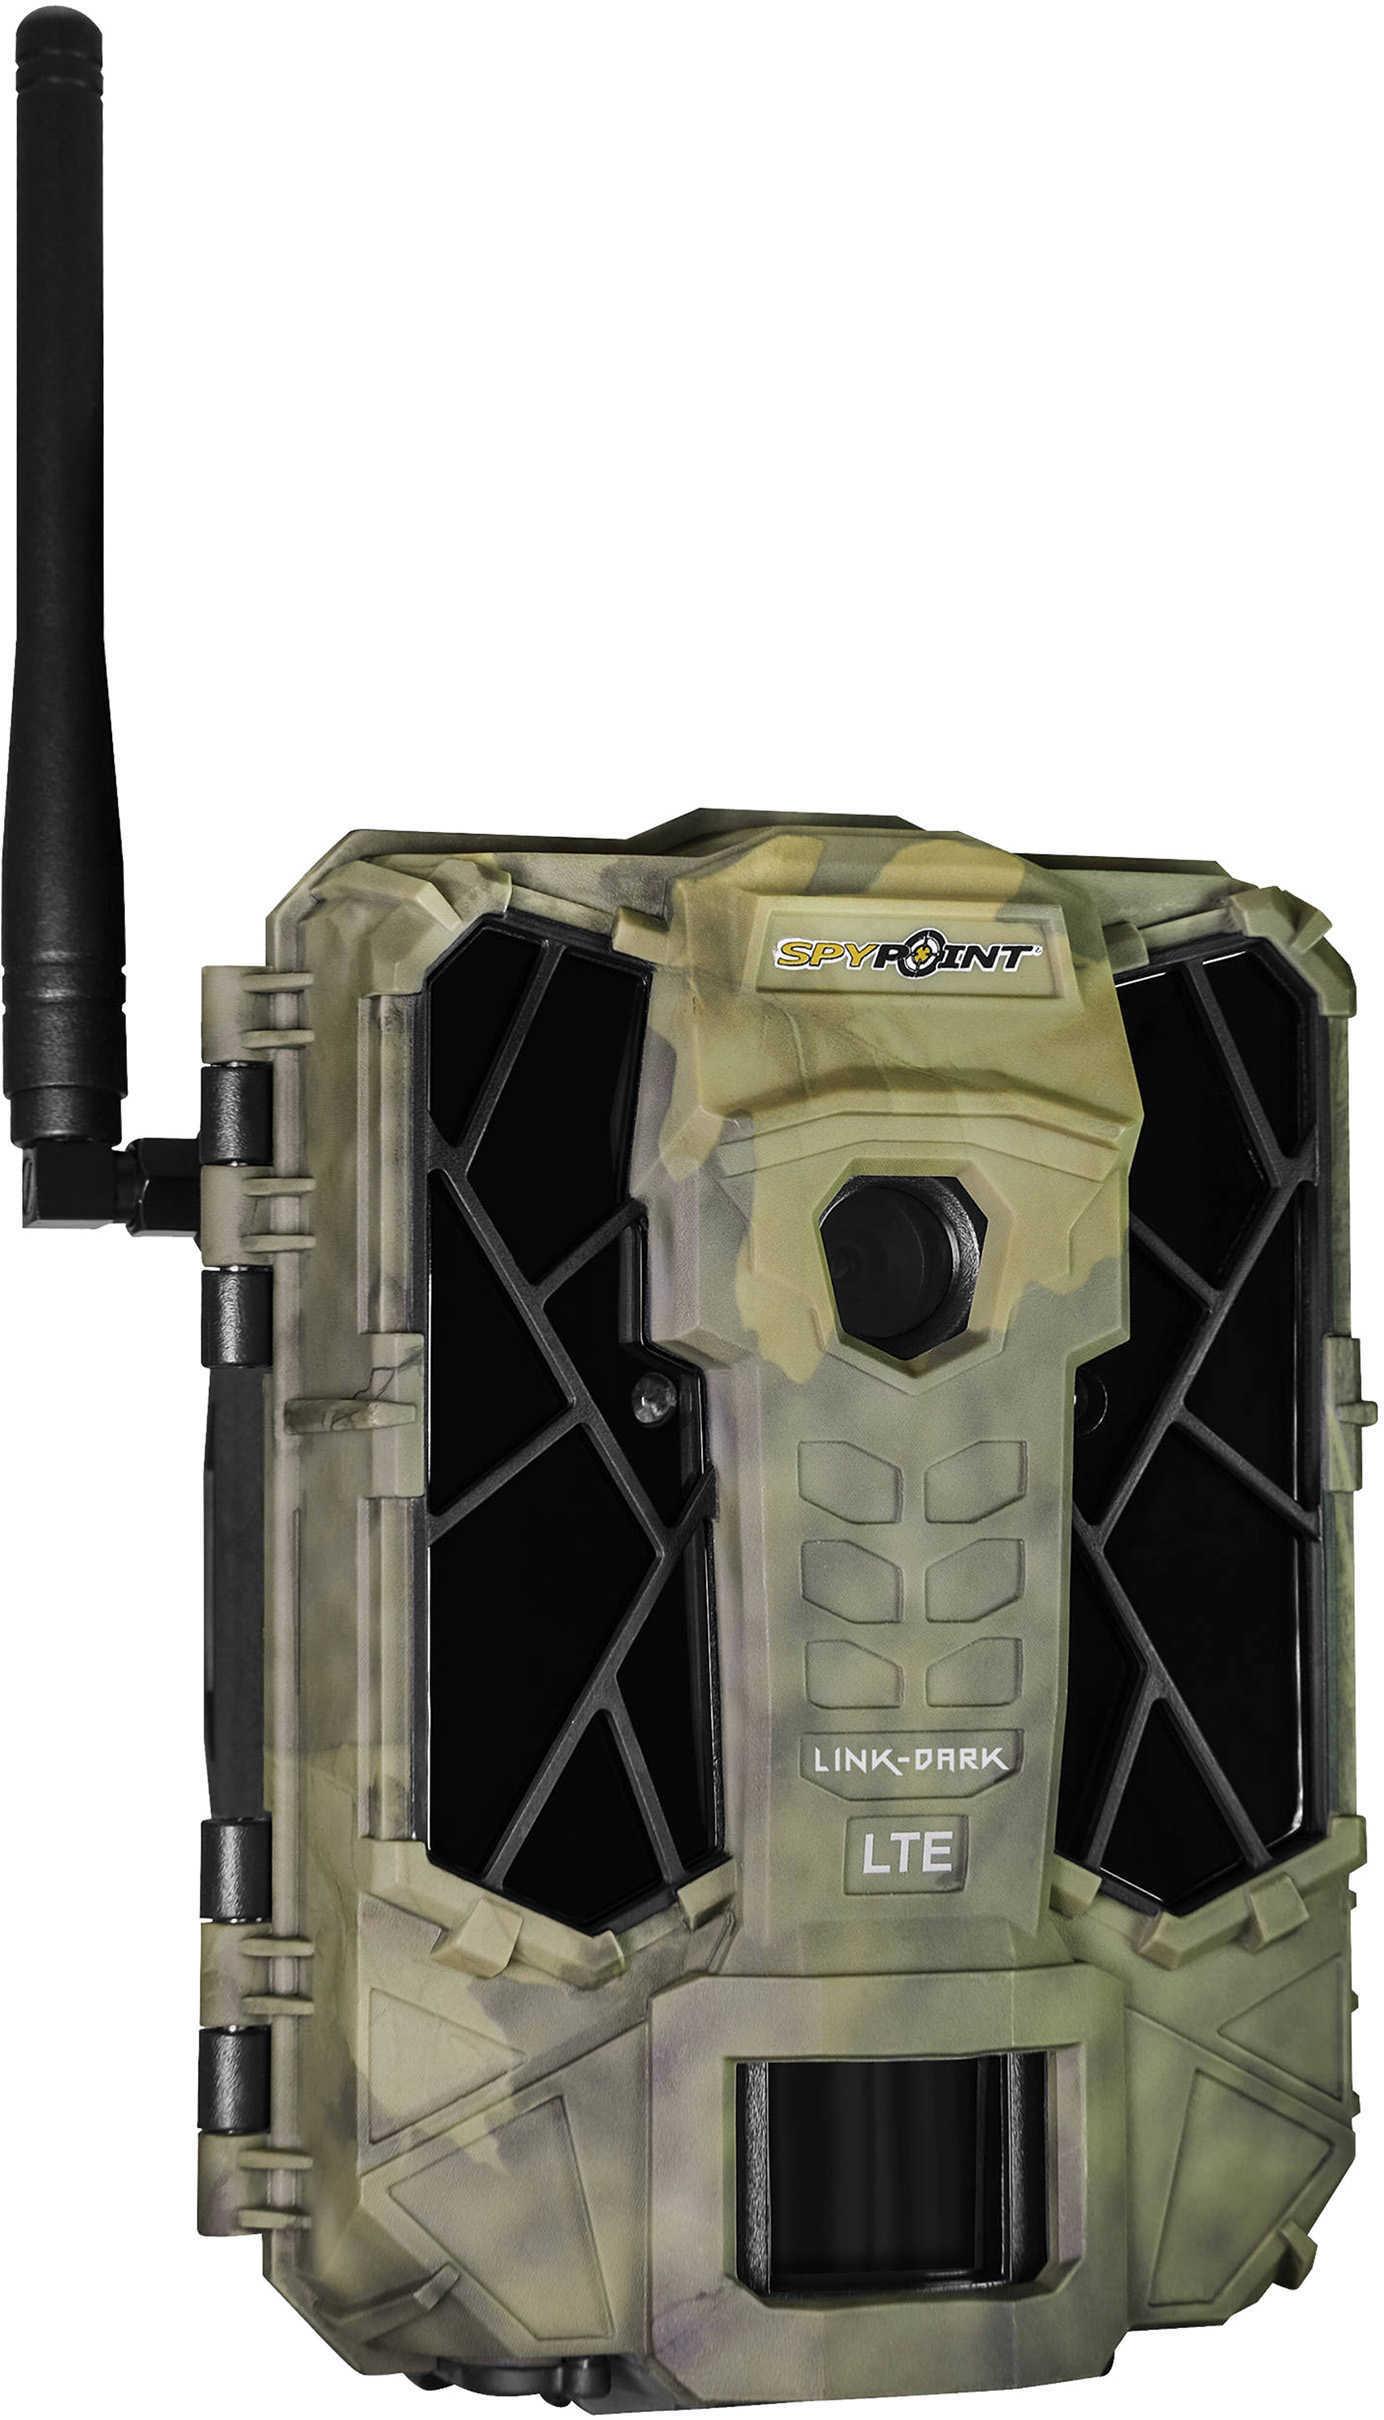 Spypoint LINKEVODARK Cellular Trail Camera 12 MP Brown